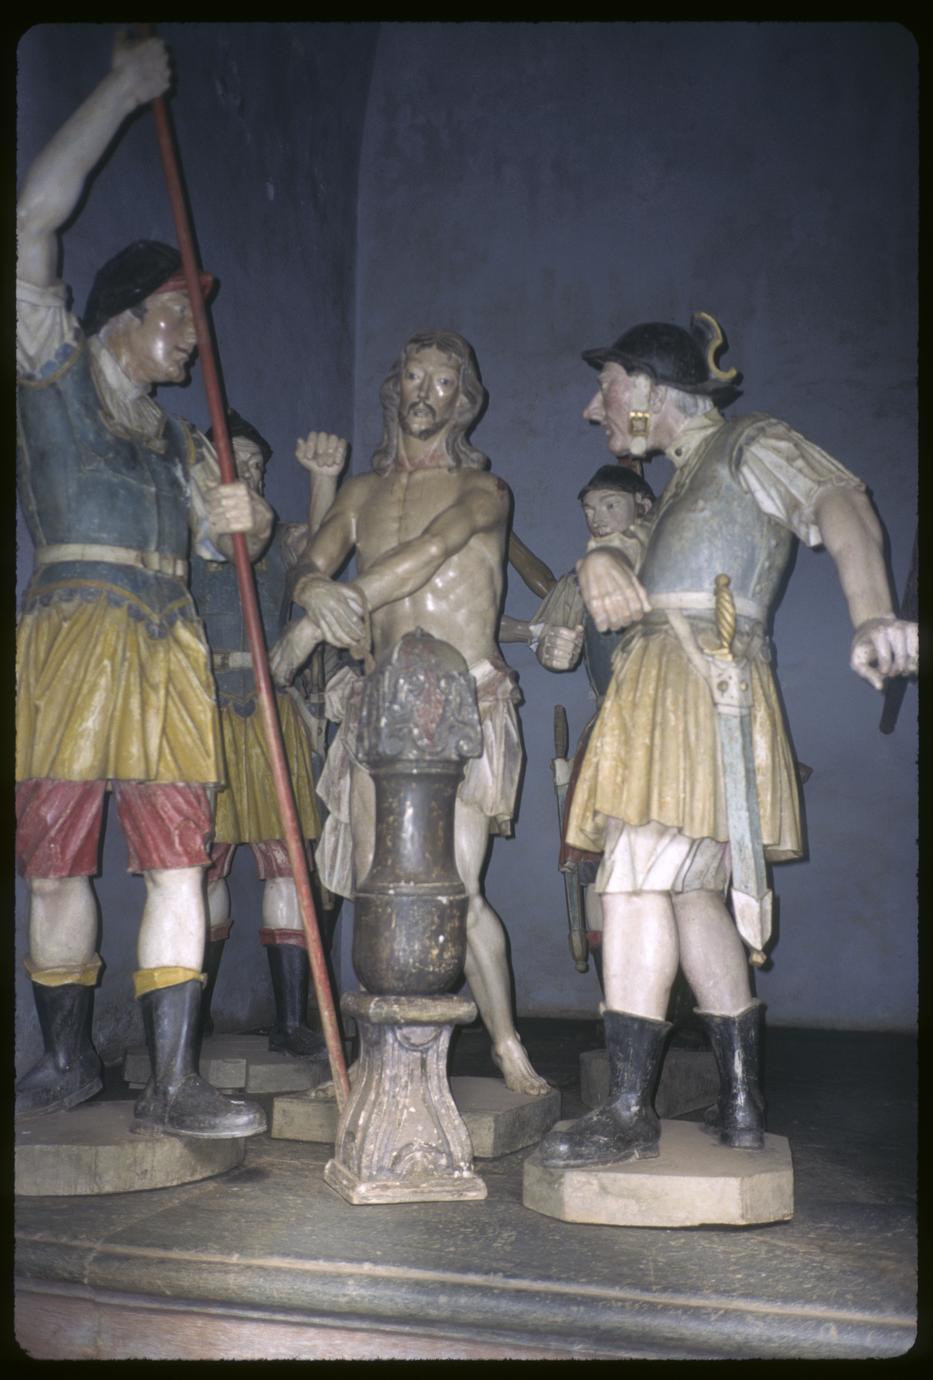 Sculptural group by Aleijandinho, interior Congonhas Basilica (1 of 3)